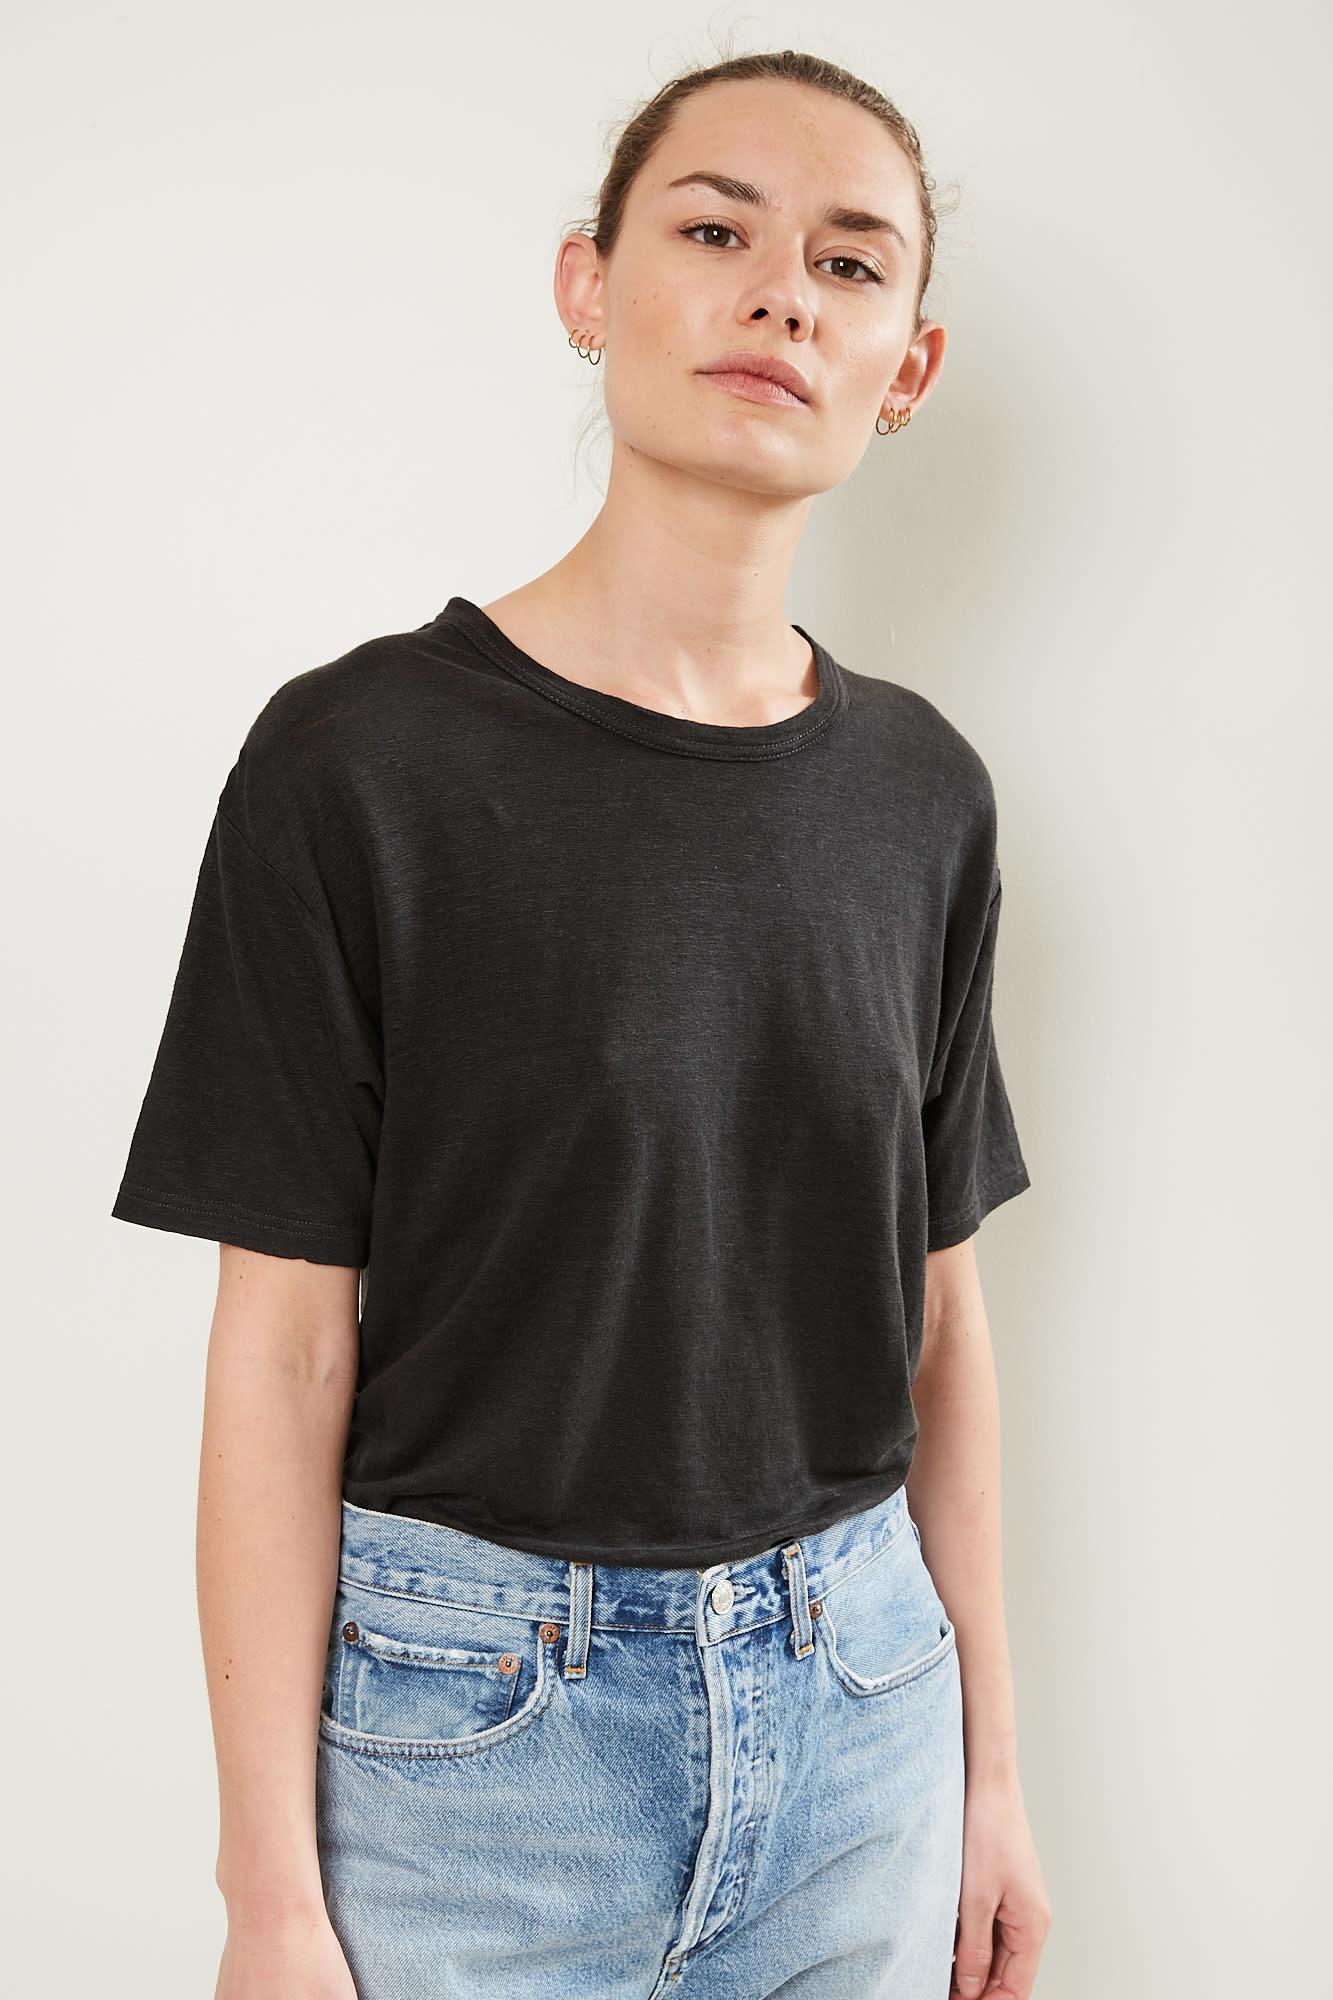 Etoile Isabel Marant - keiran tee shirt